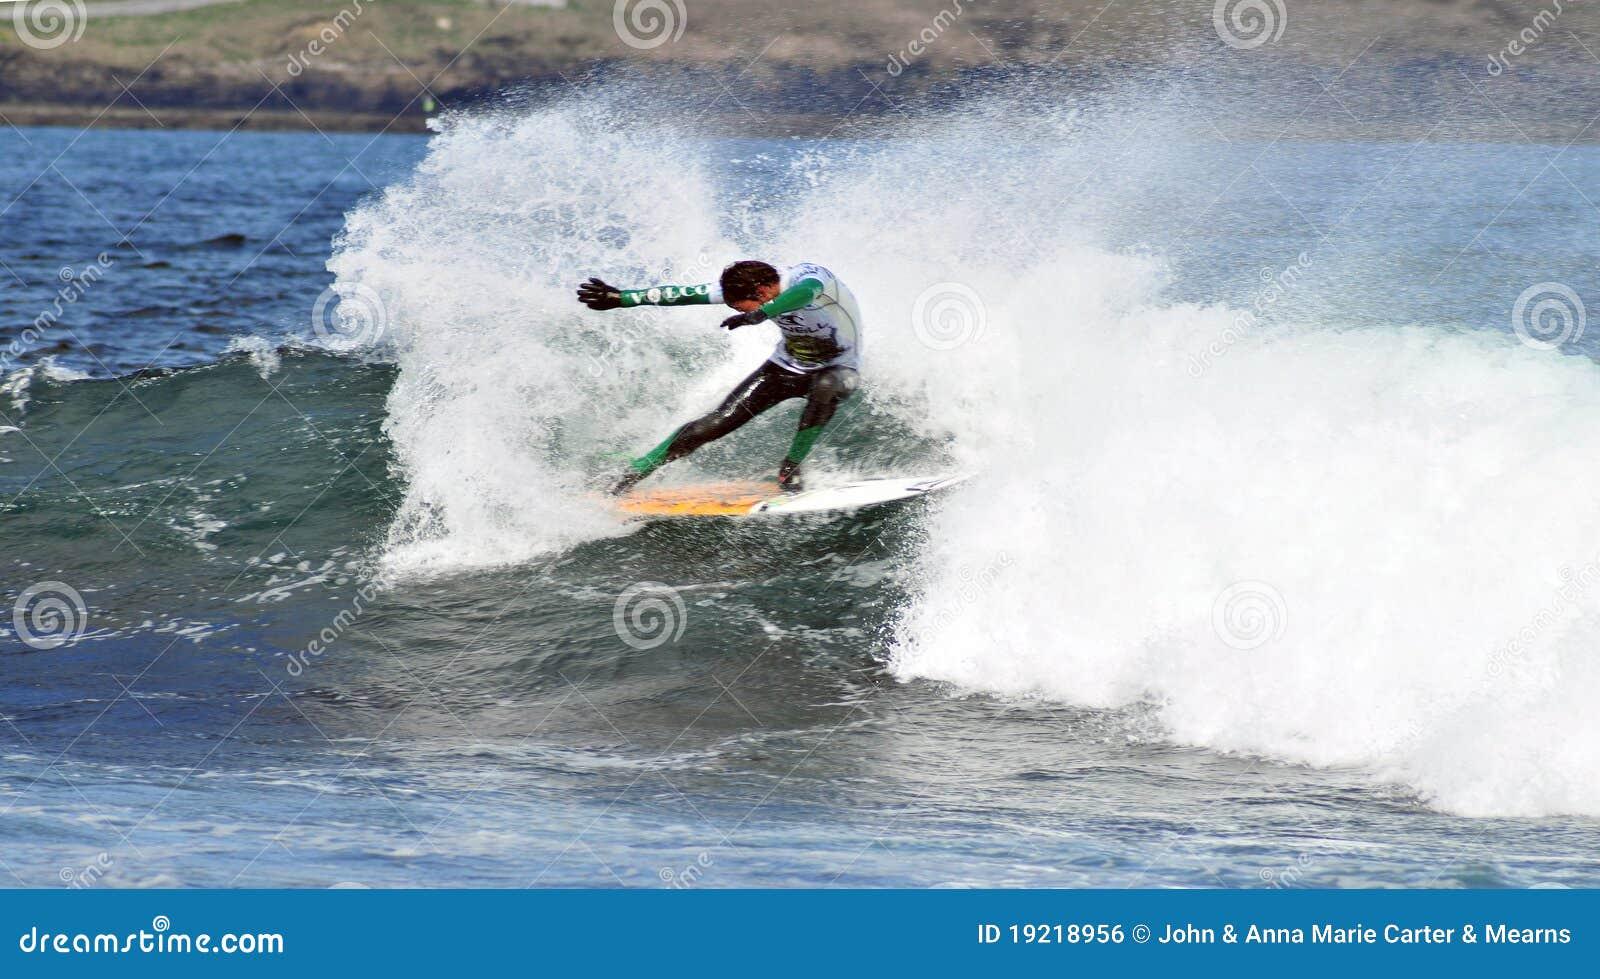 Surfer dancing on a wave